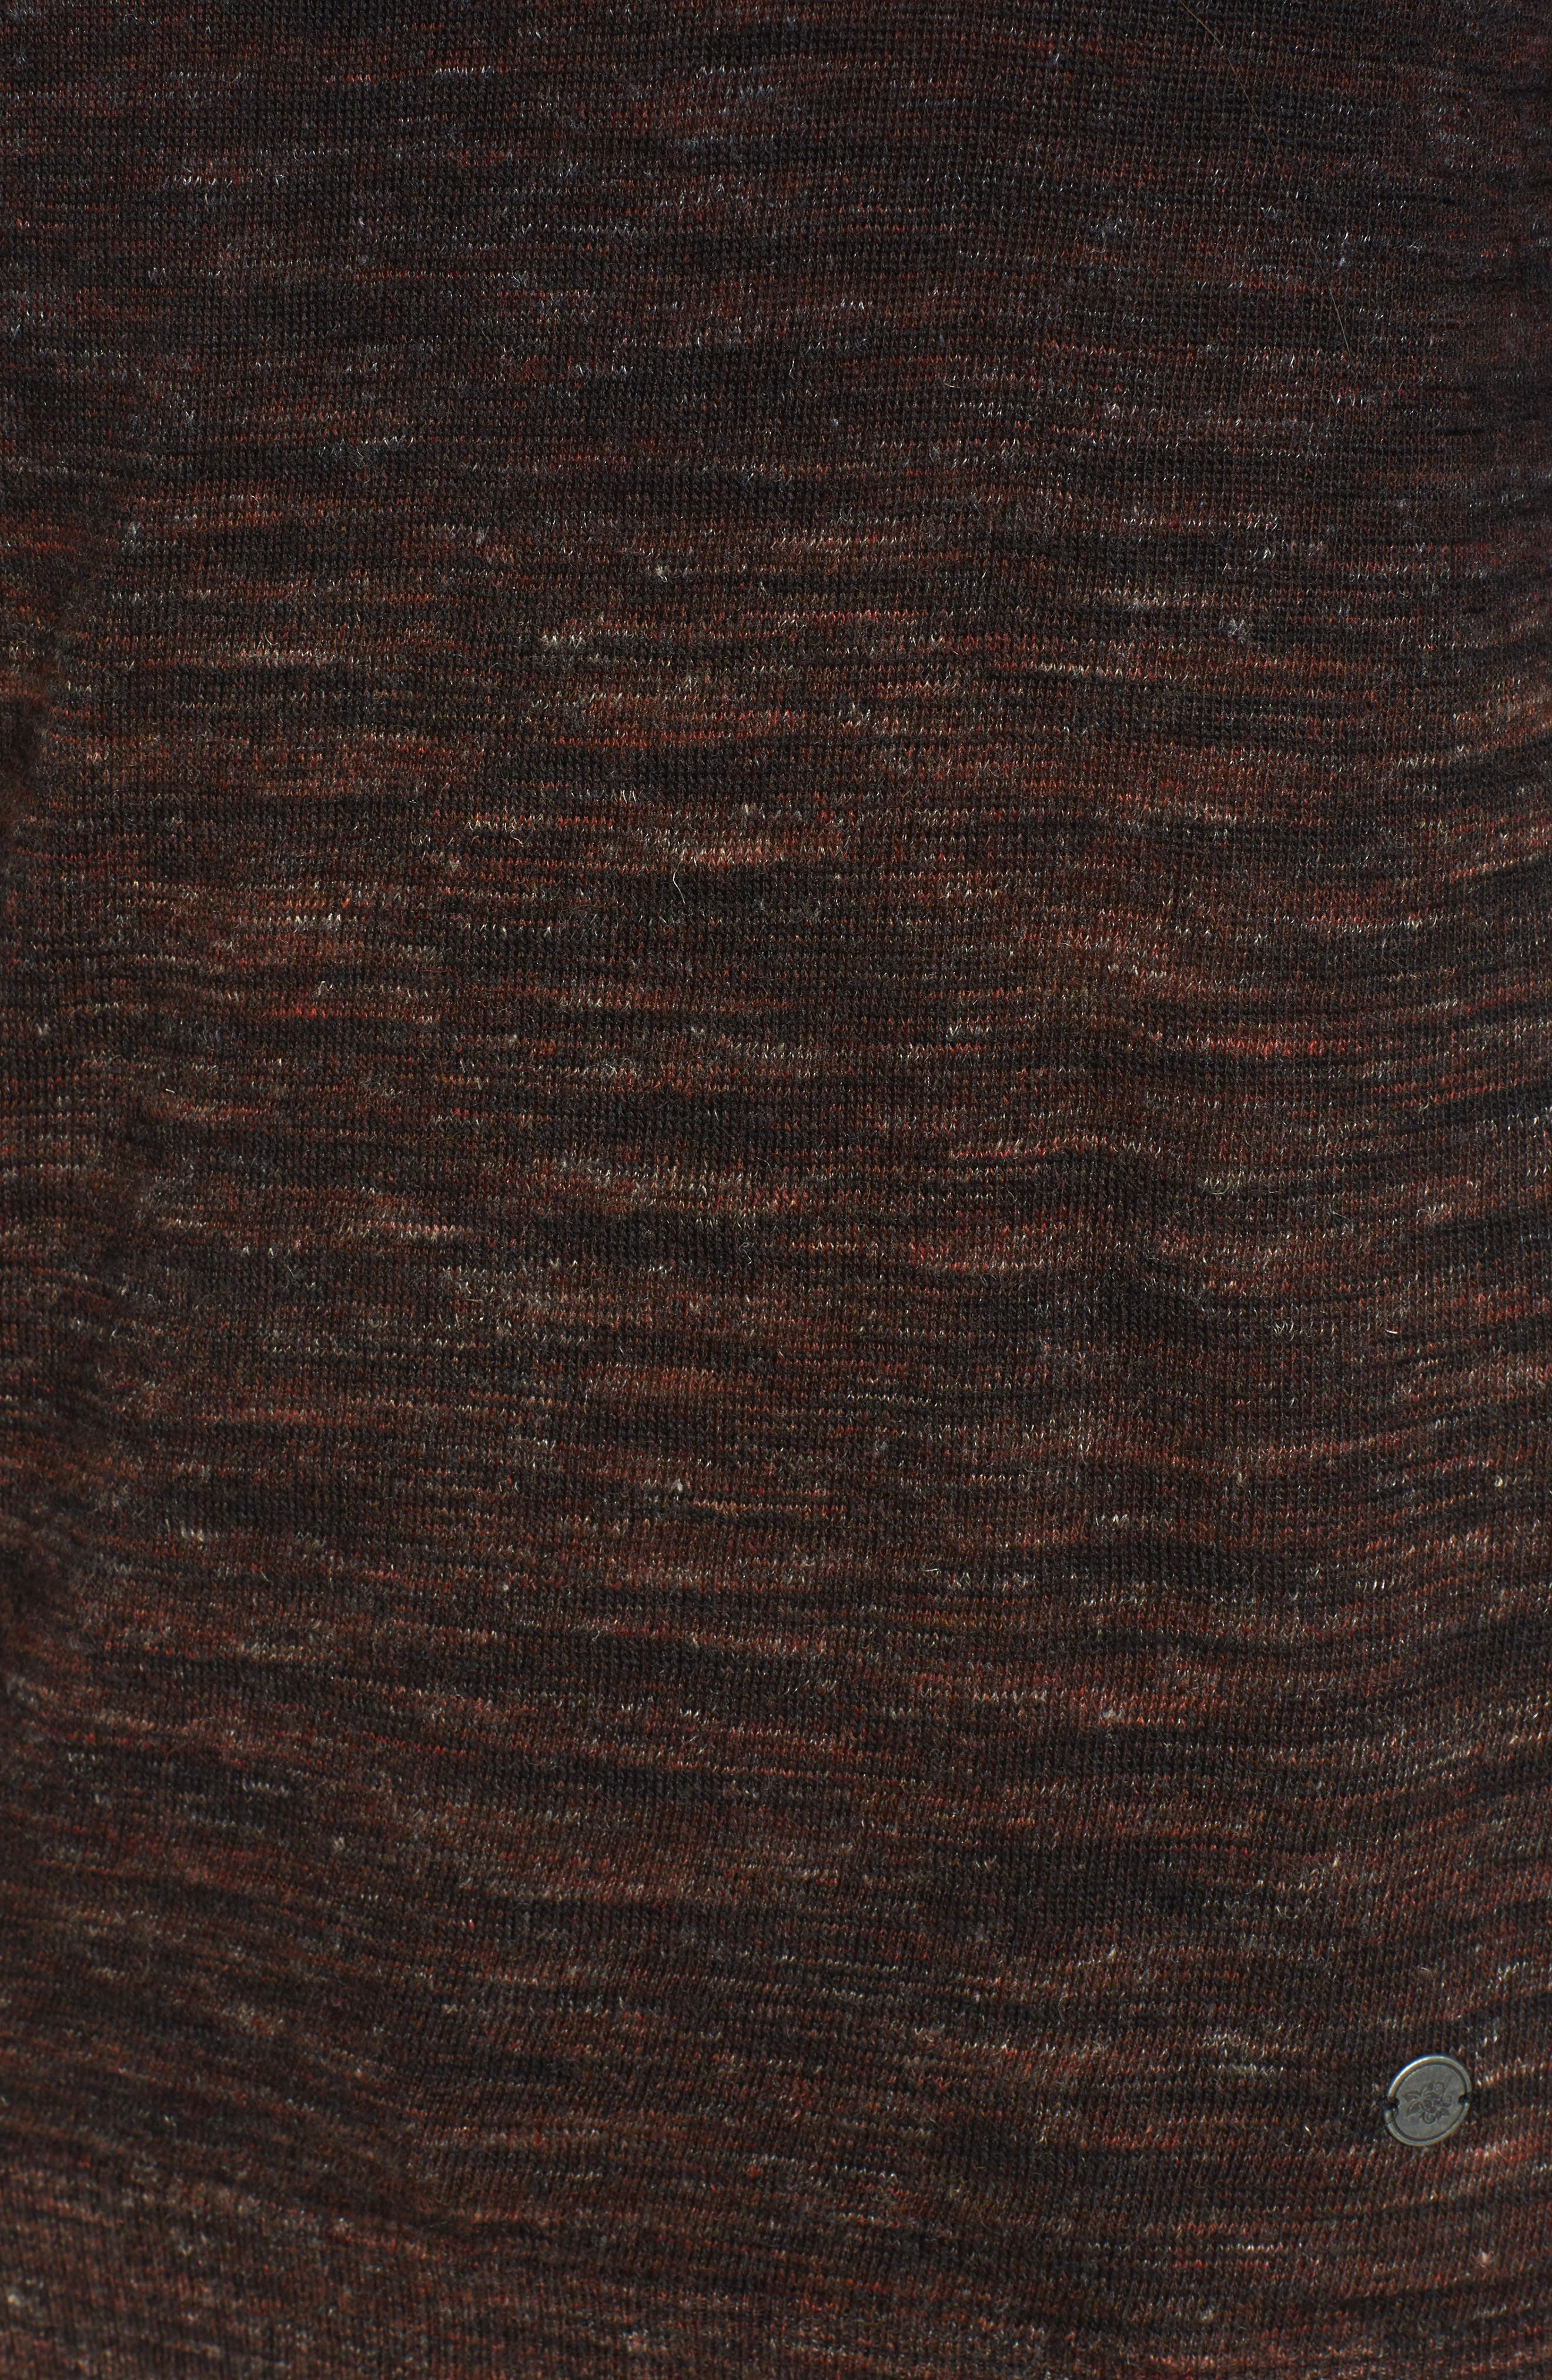 Regular Fit Dip Dye Turtleneck,                             Alternate thumbnail 5, color,                             Amber